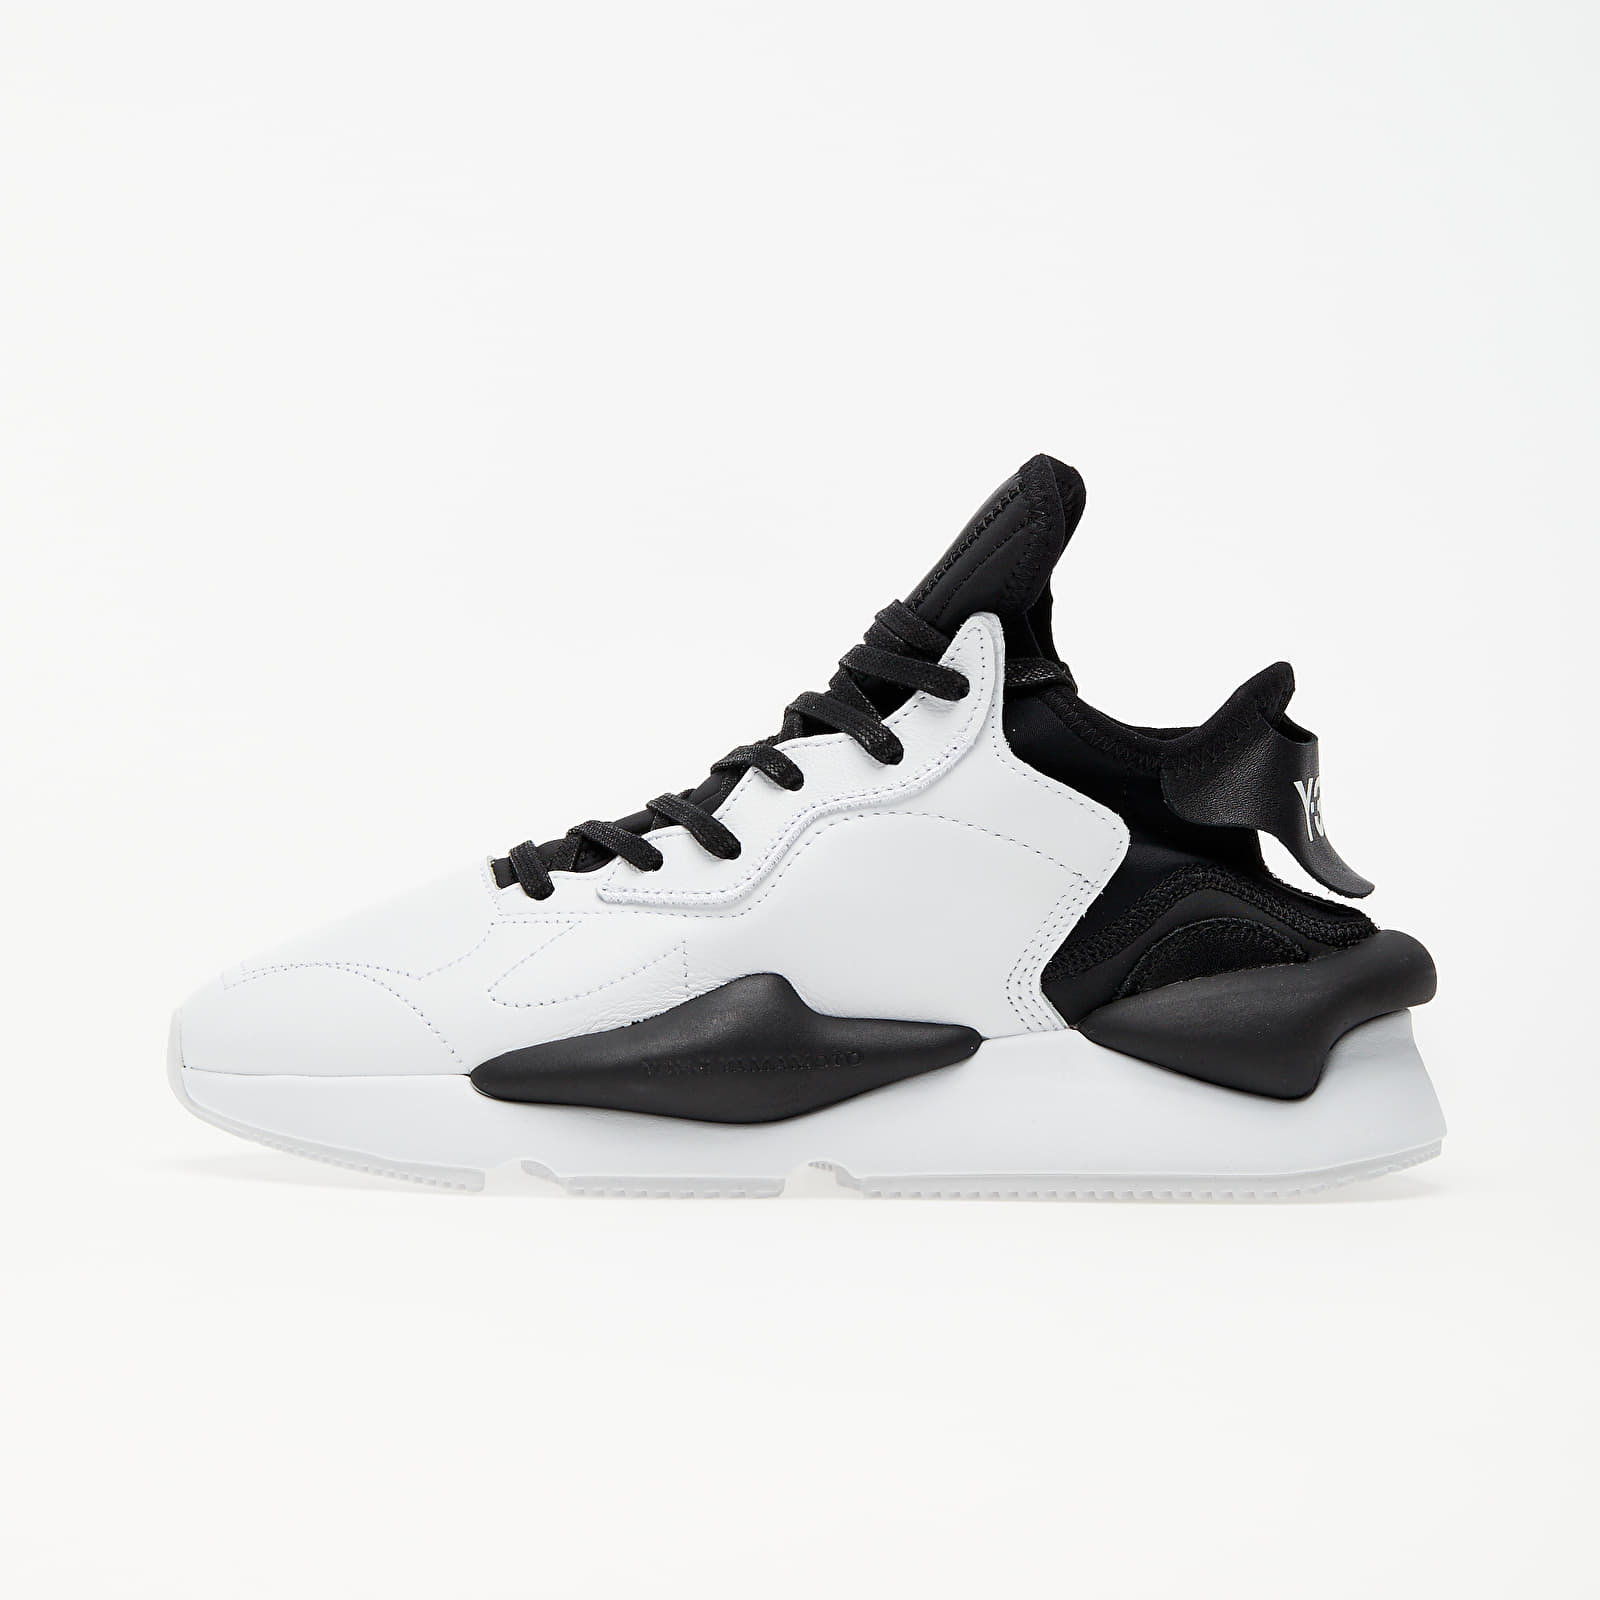 Men's shoes Y-3 Kaiwa White/ None/ None